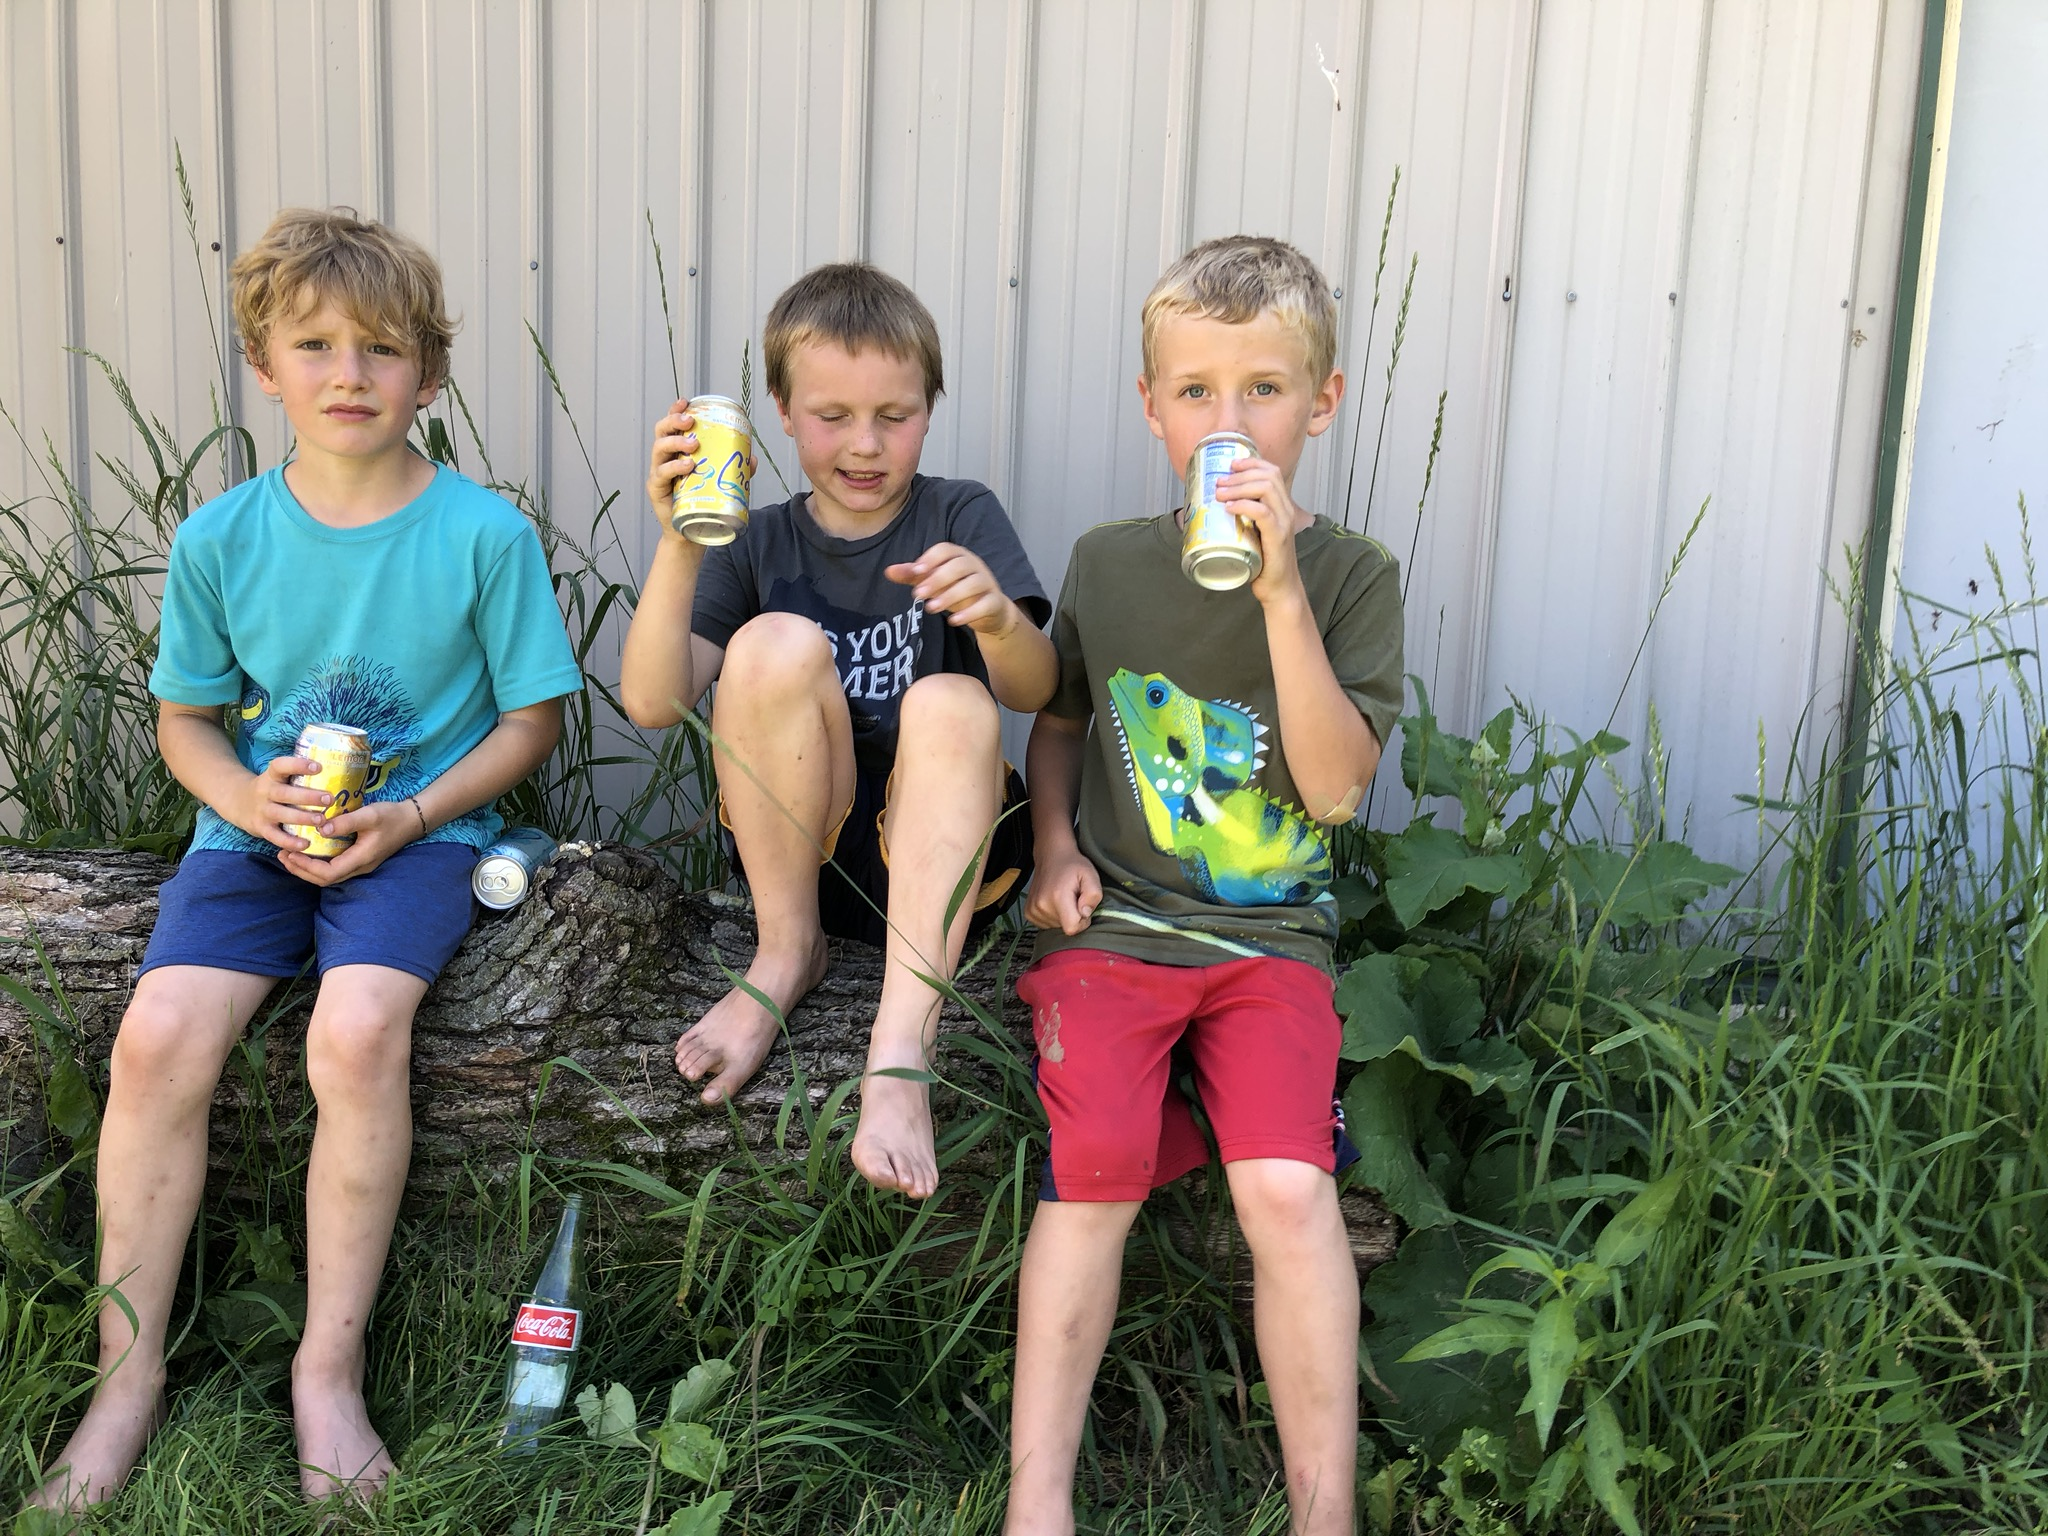 LaCroix Boys keeping cool on the farm tour